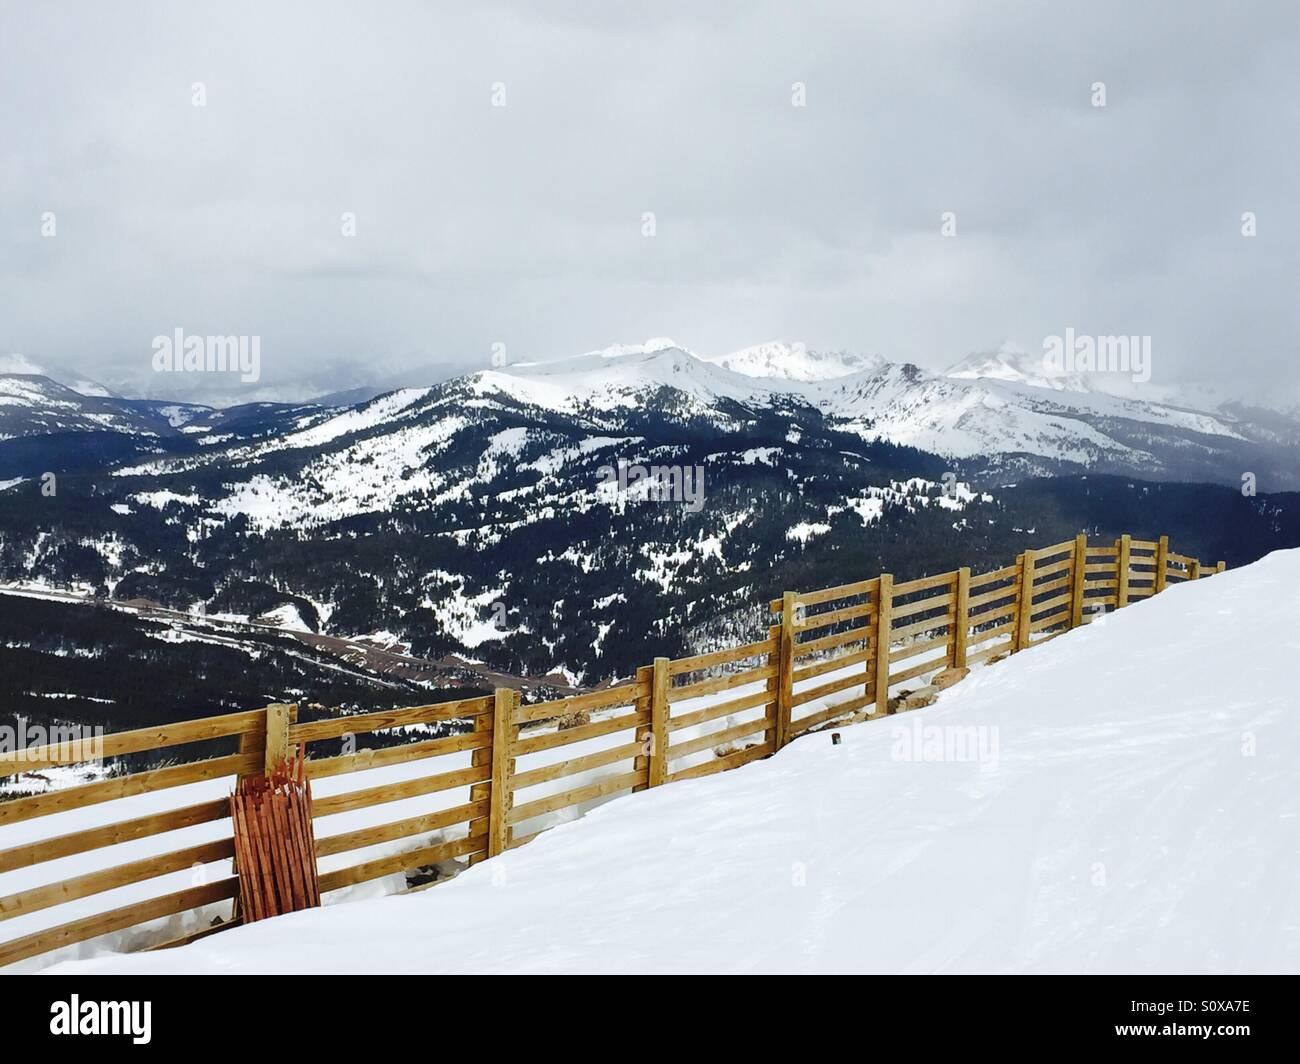 Copper Mountain Ski Area, Colorado. 9 March 2016   A Snow Fence With The